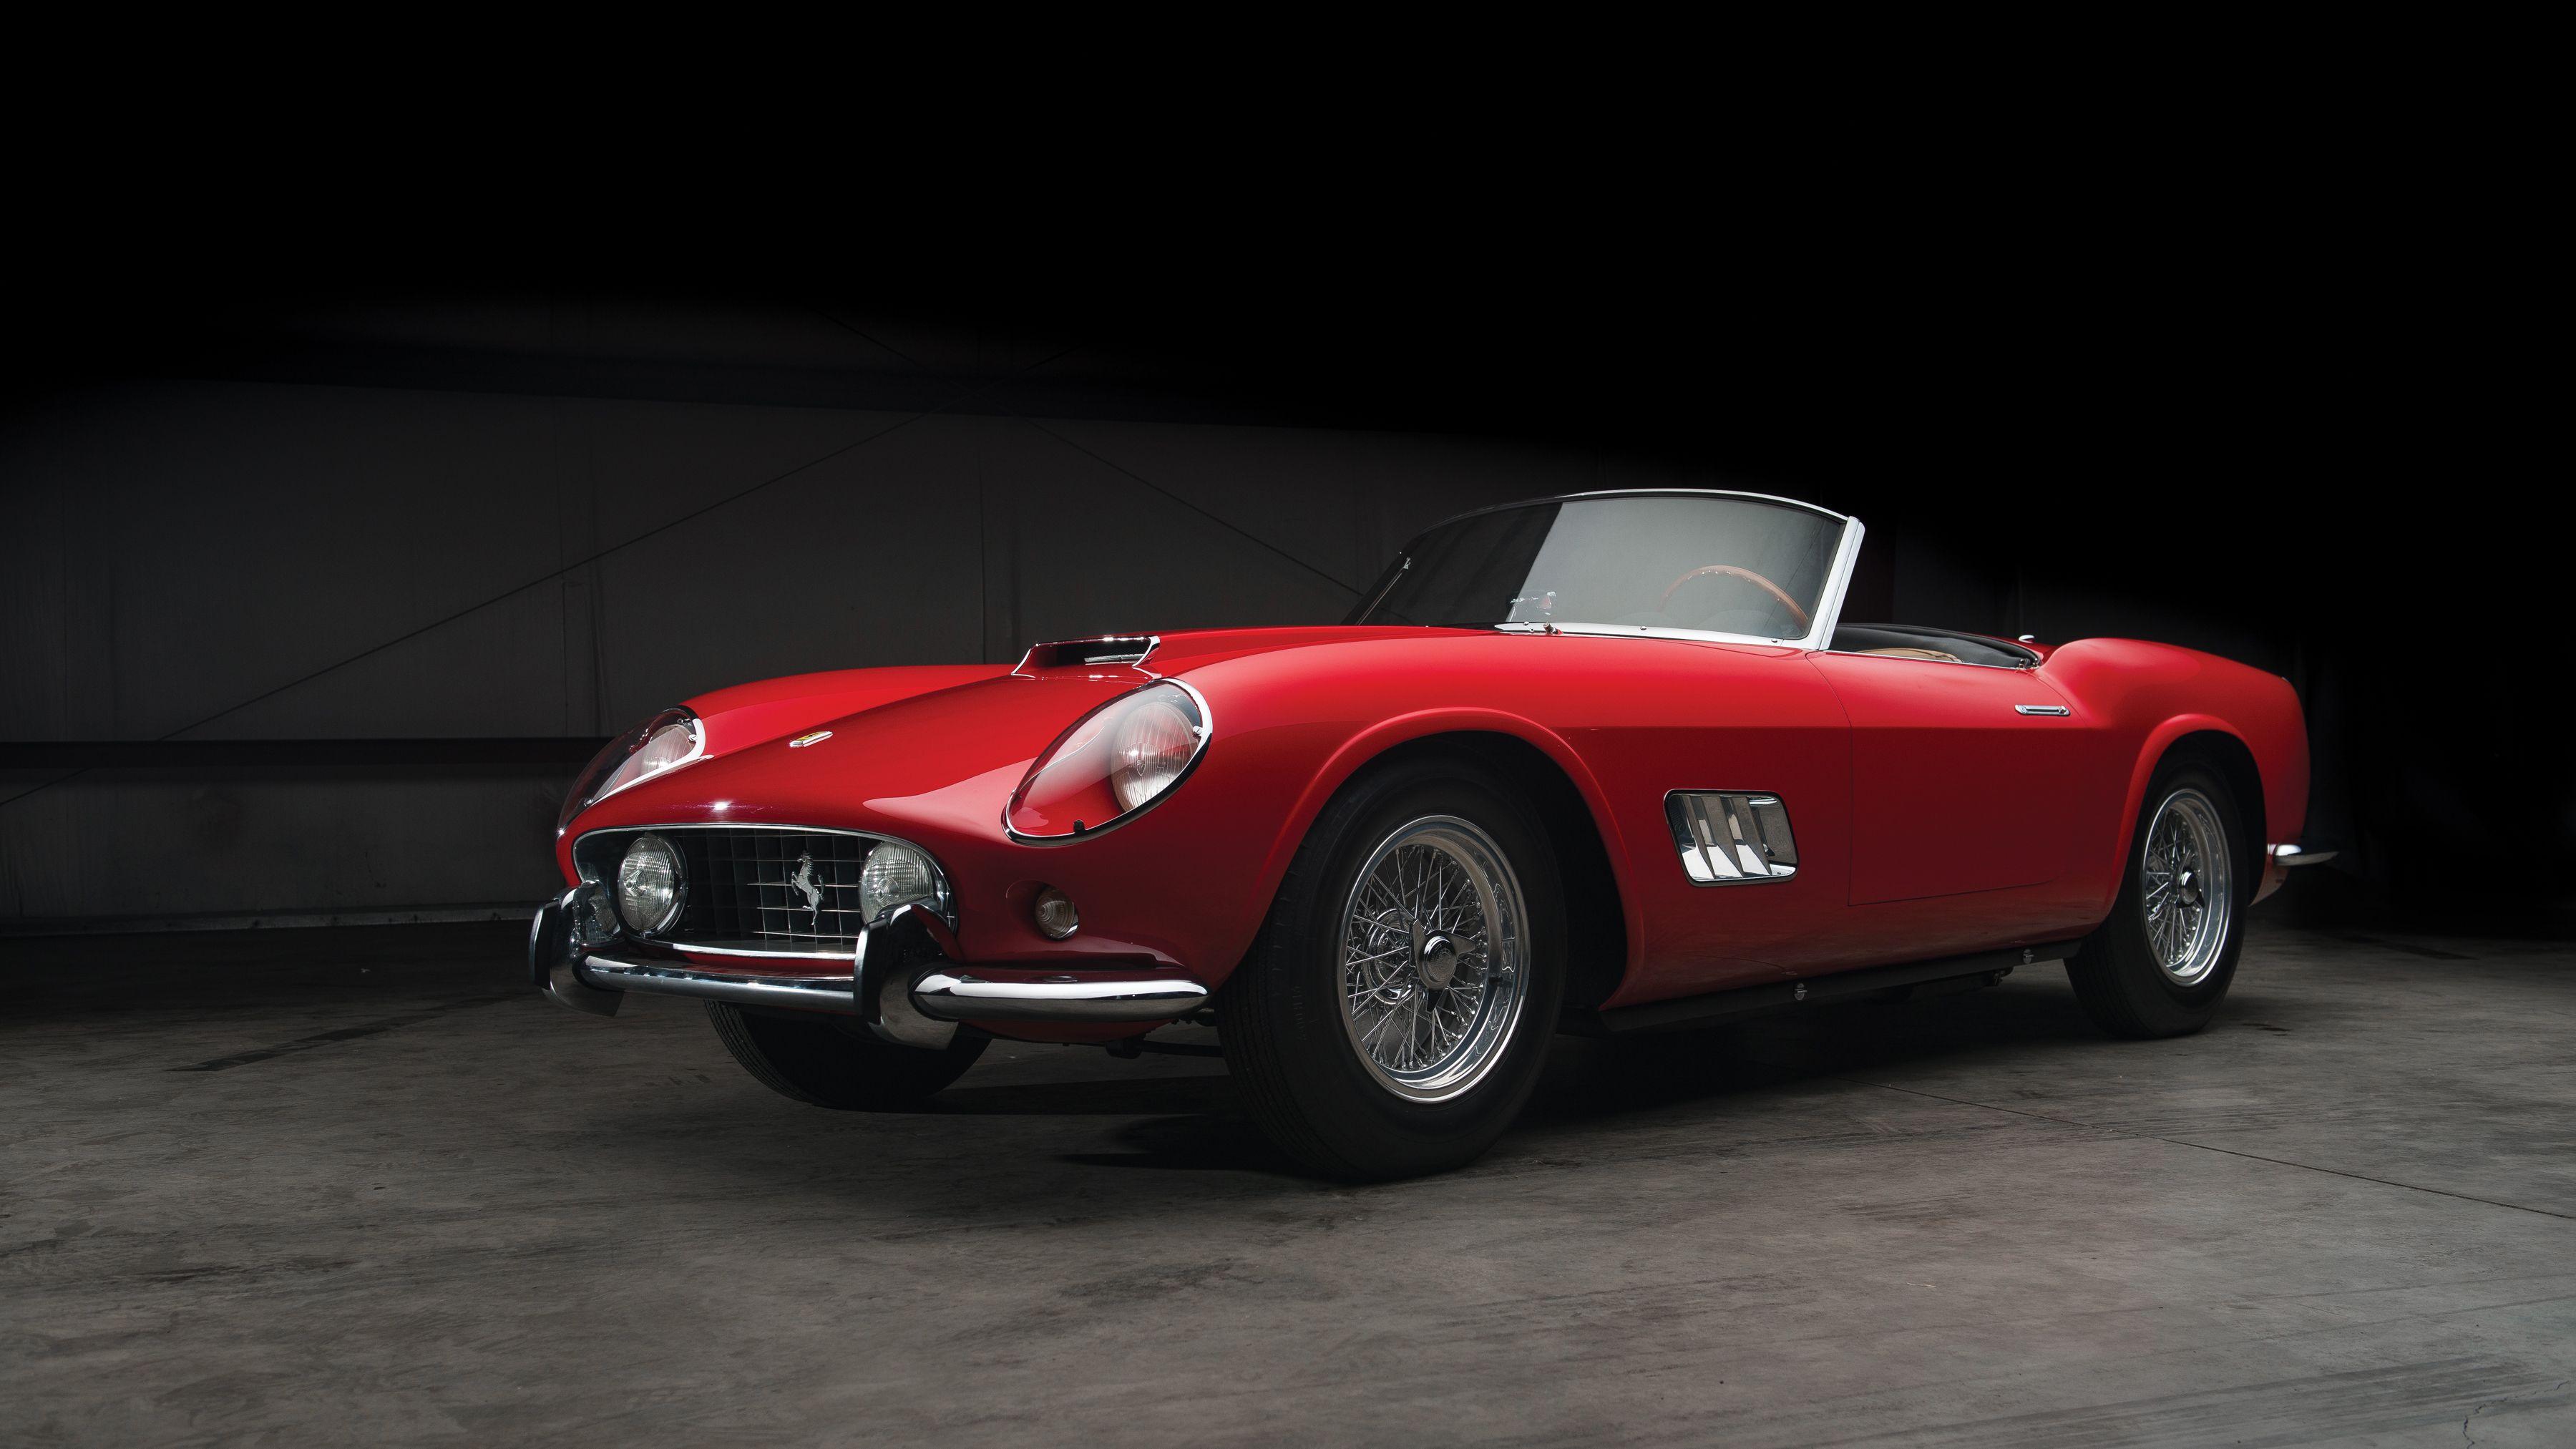 Ferrari 250 GT LWB California Spider 1959 | Ferrari 250 | Pinterest ...